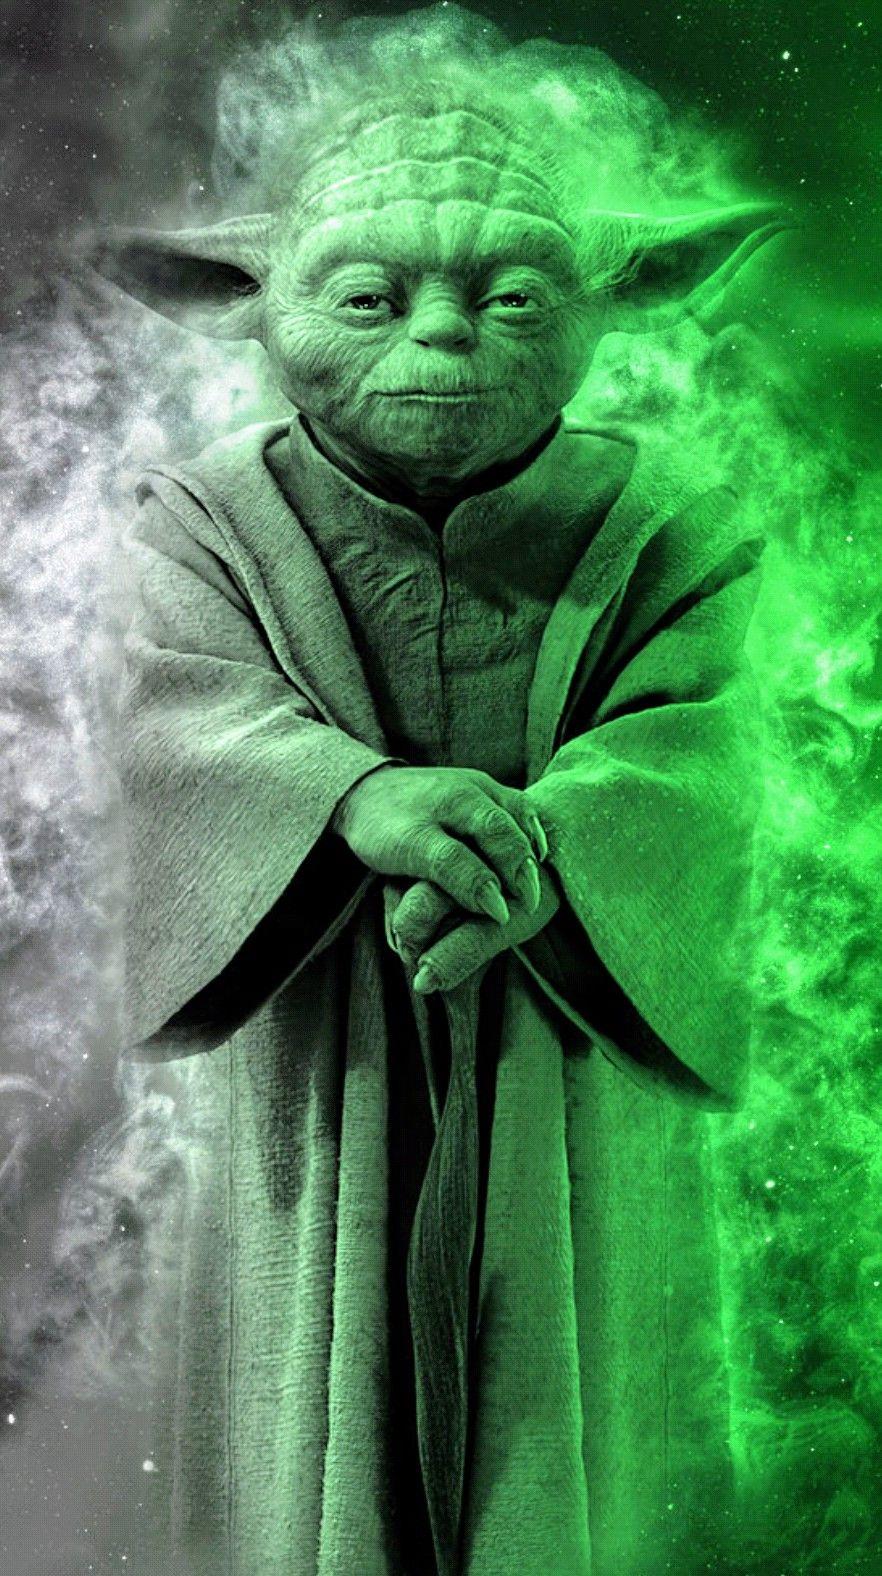 Cool Looking Artwork Of Jedi Master Yoda Starwars Yoda Jediknight Jedi Maytheforcebewithyo Star Wars Background Star Wars Images Star Wars Movies Posters